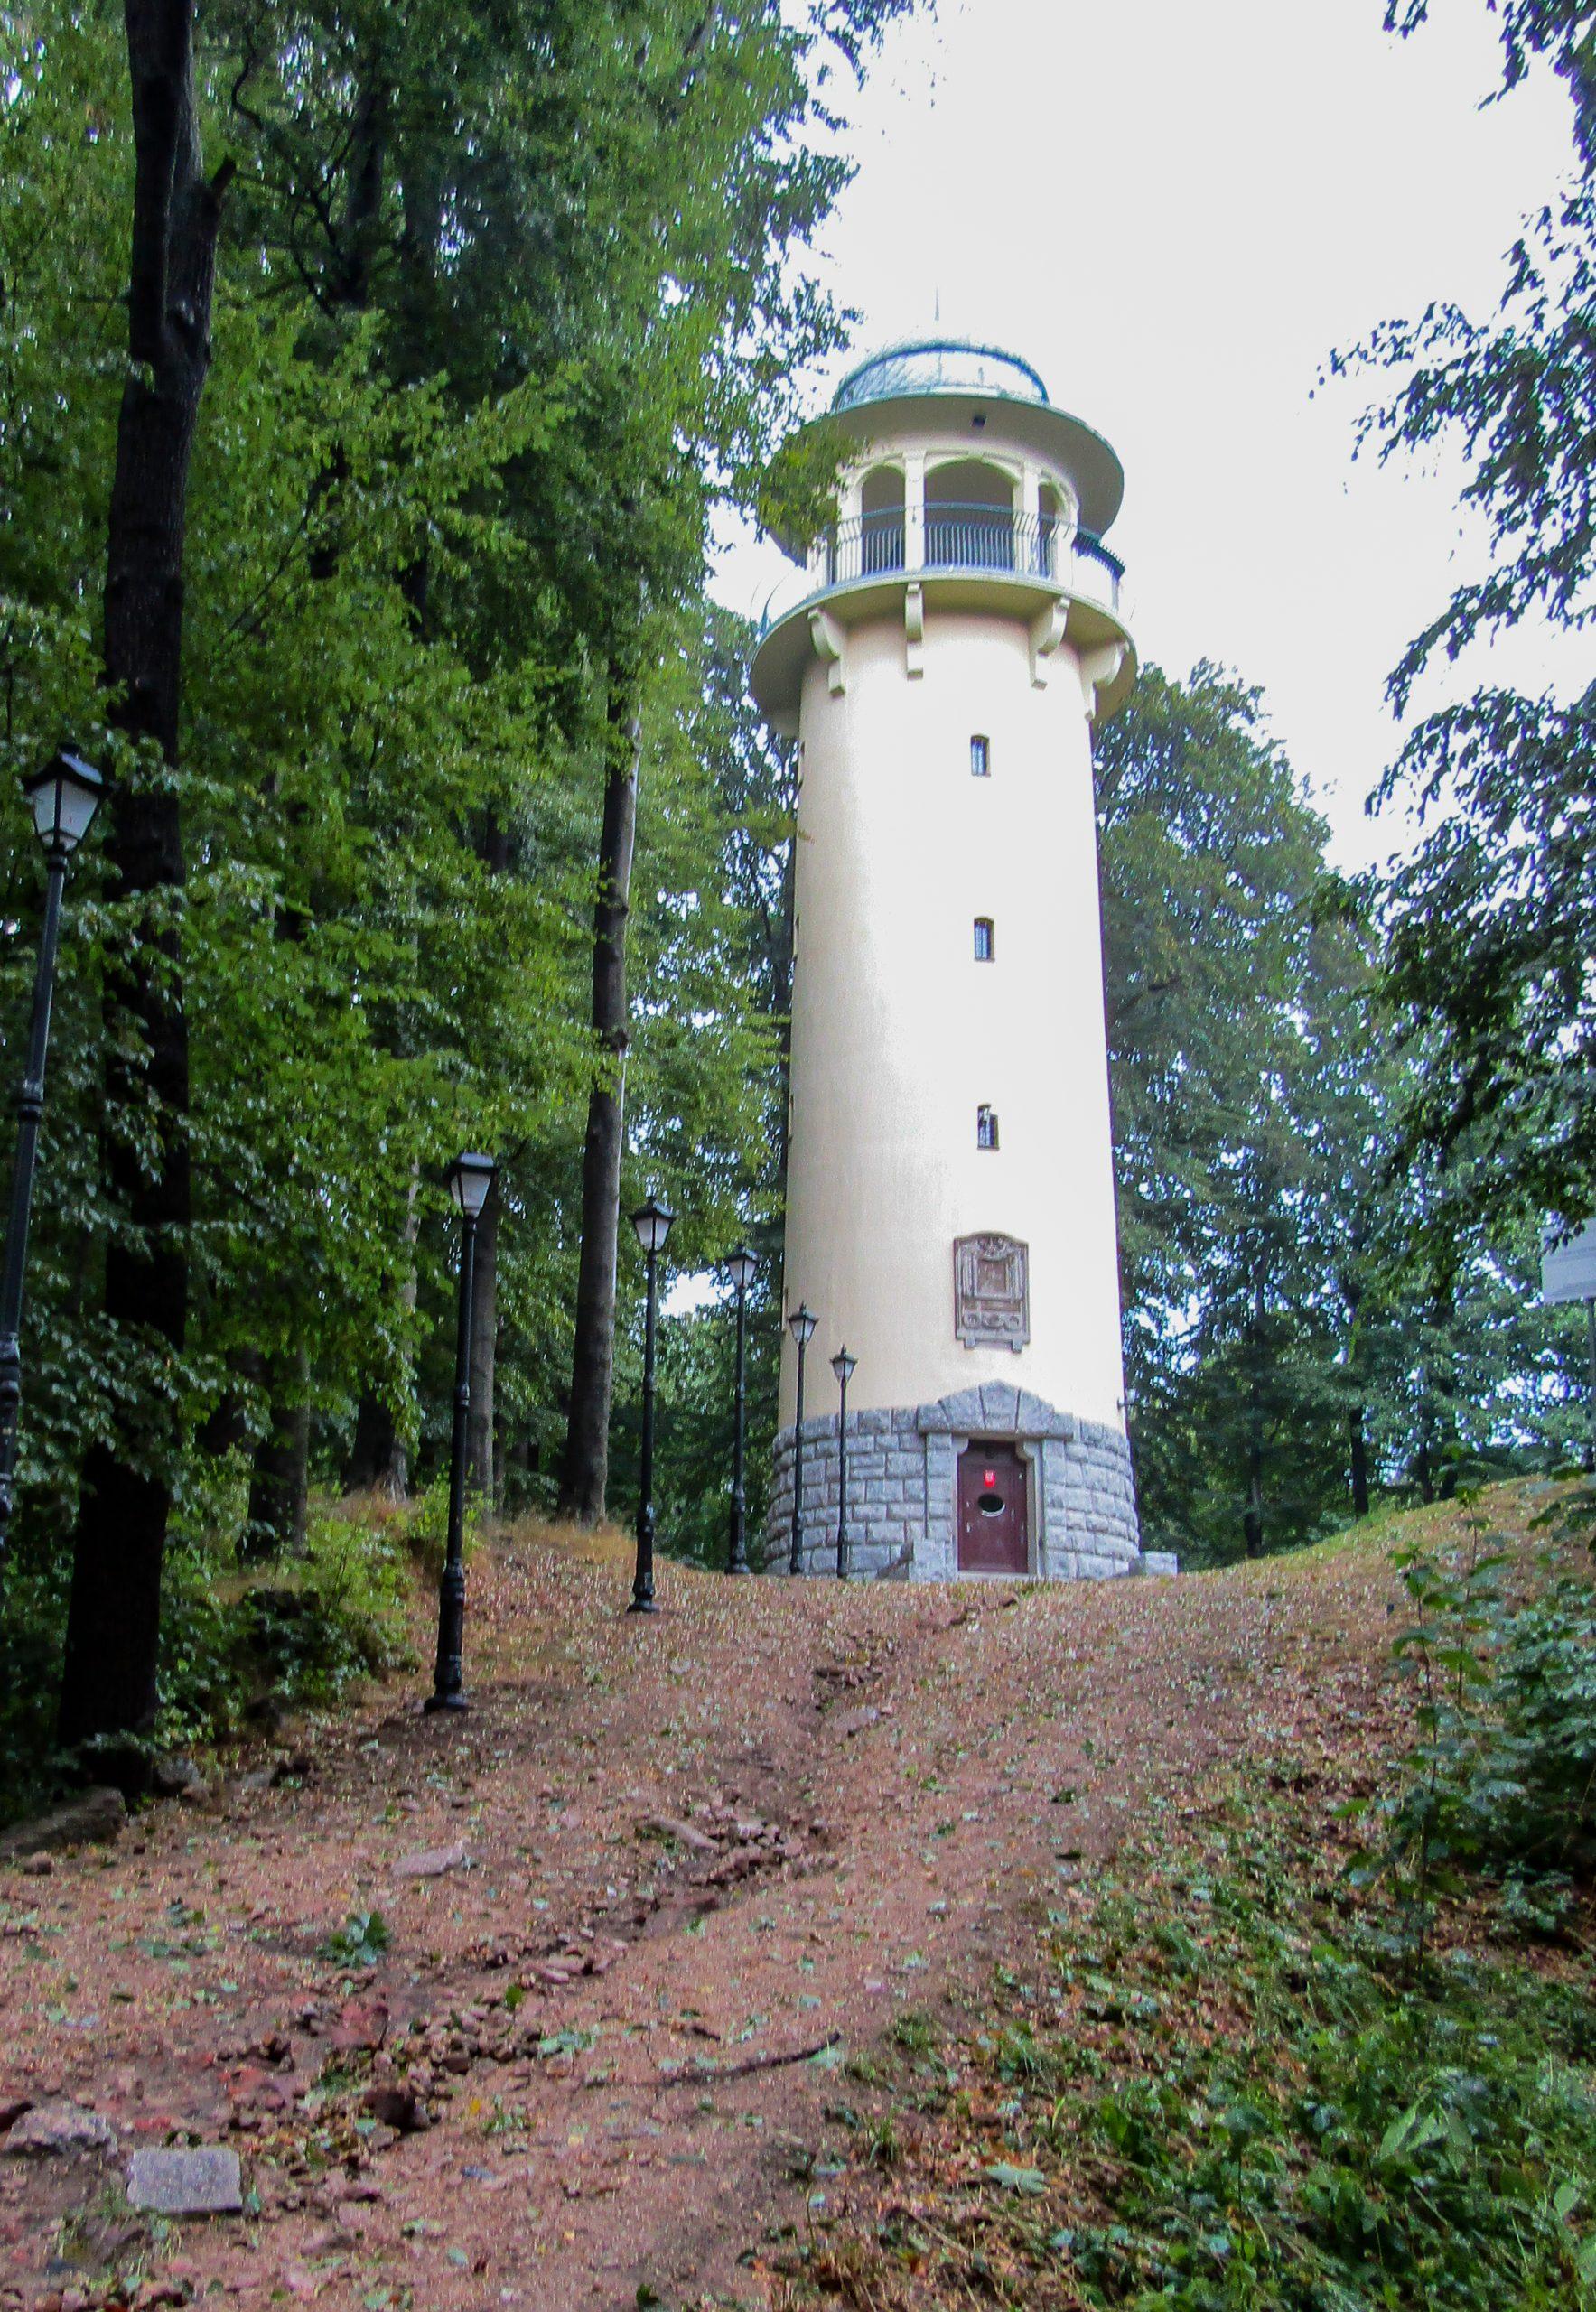 Grzybek Viewing Tower